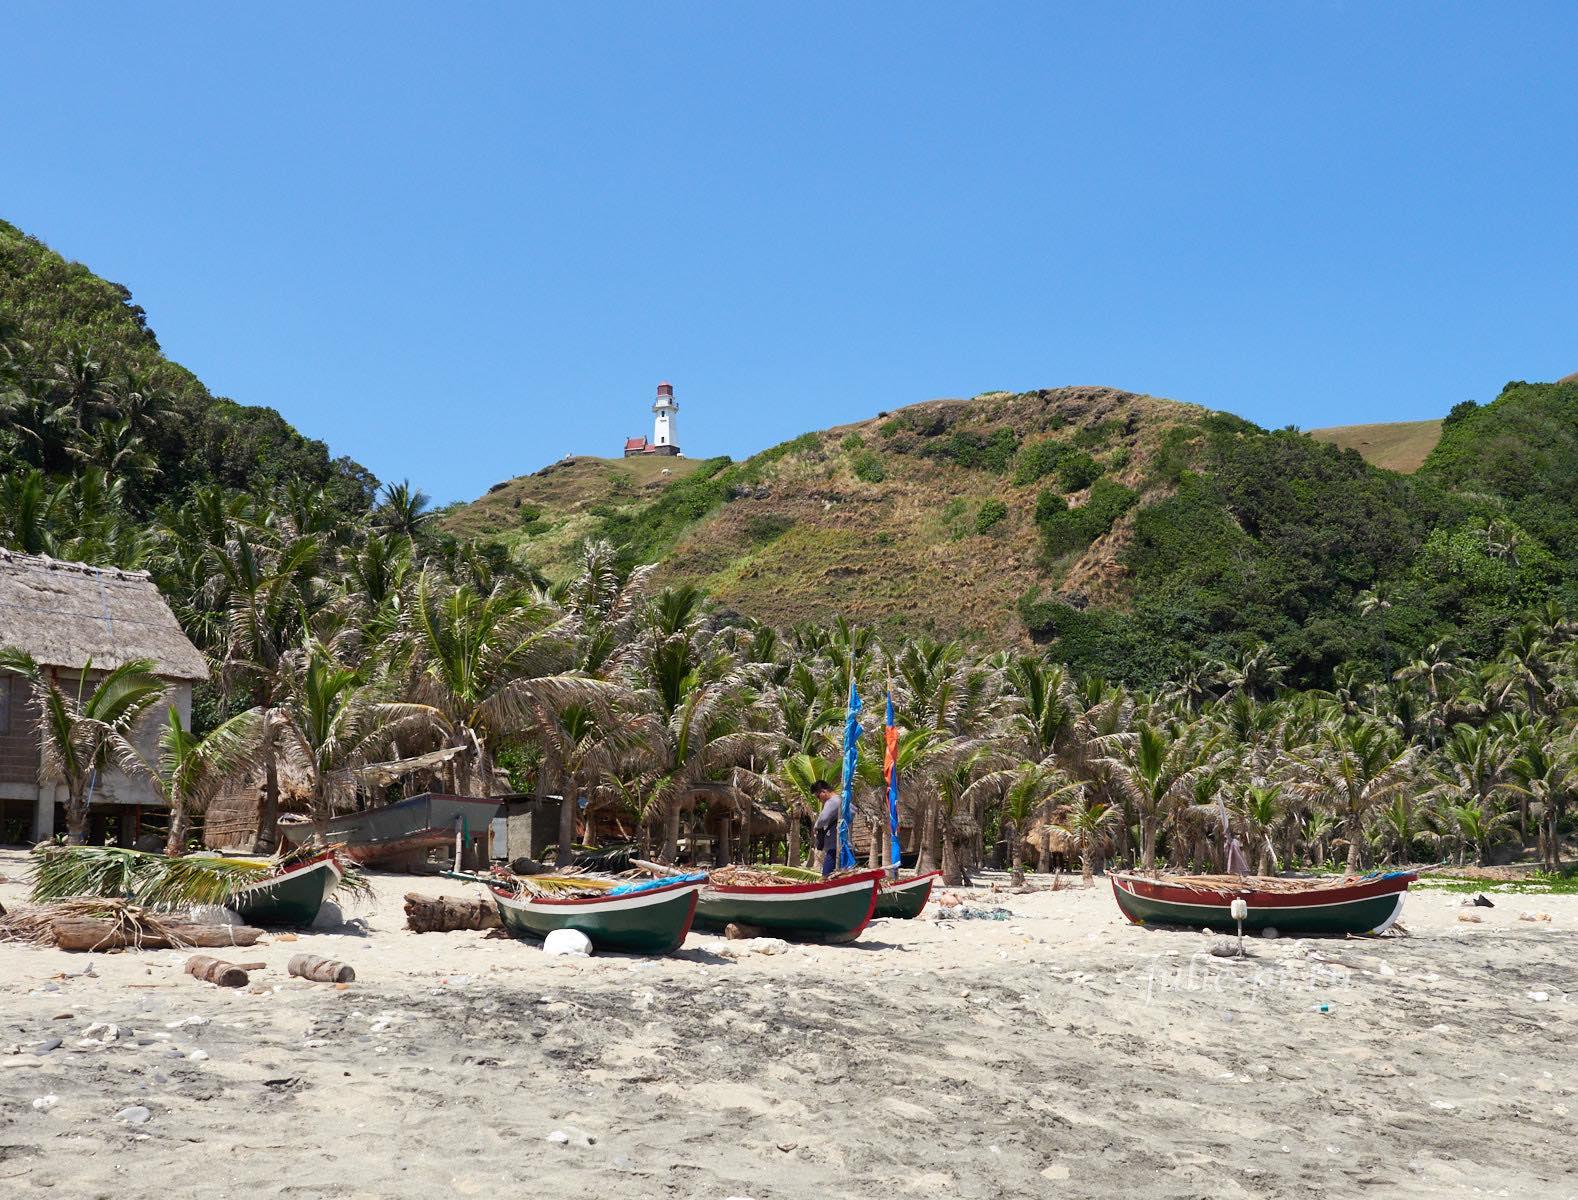 Филиппины, острова Батанес, Diura beach